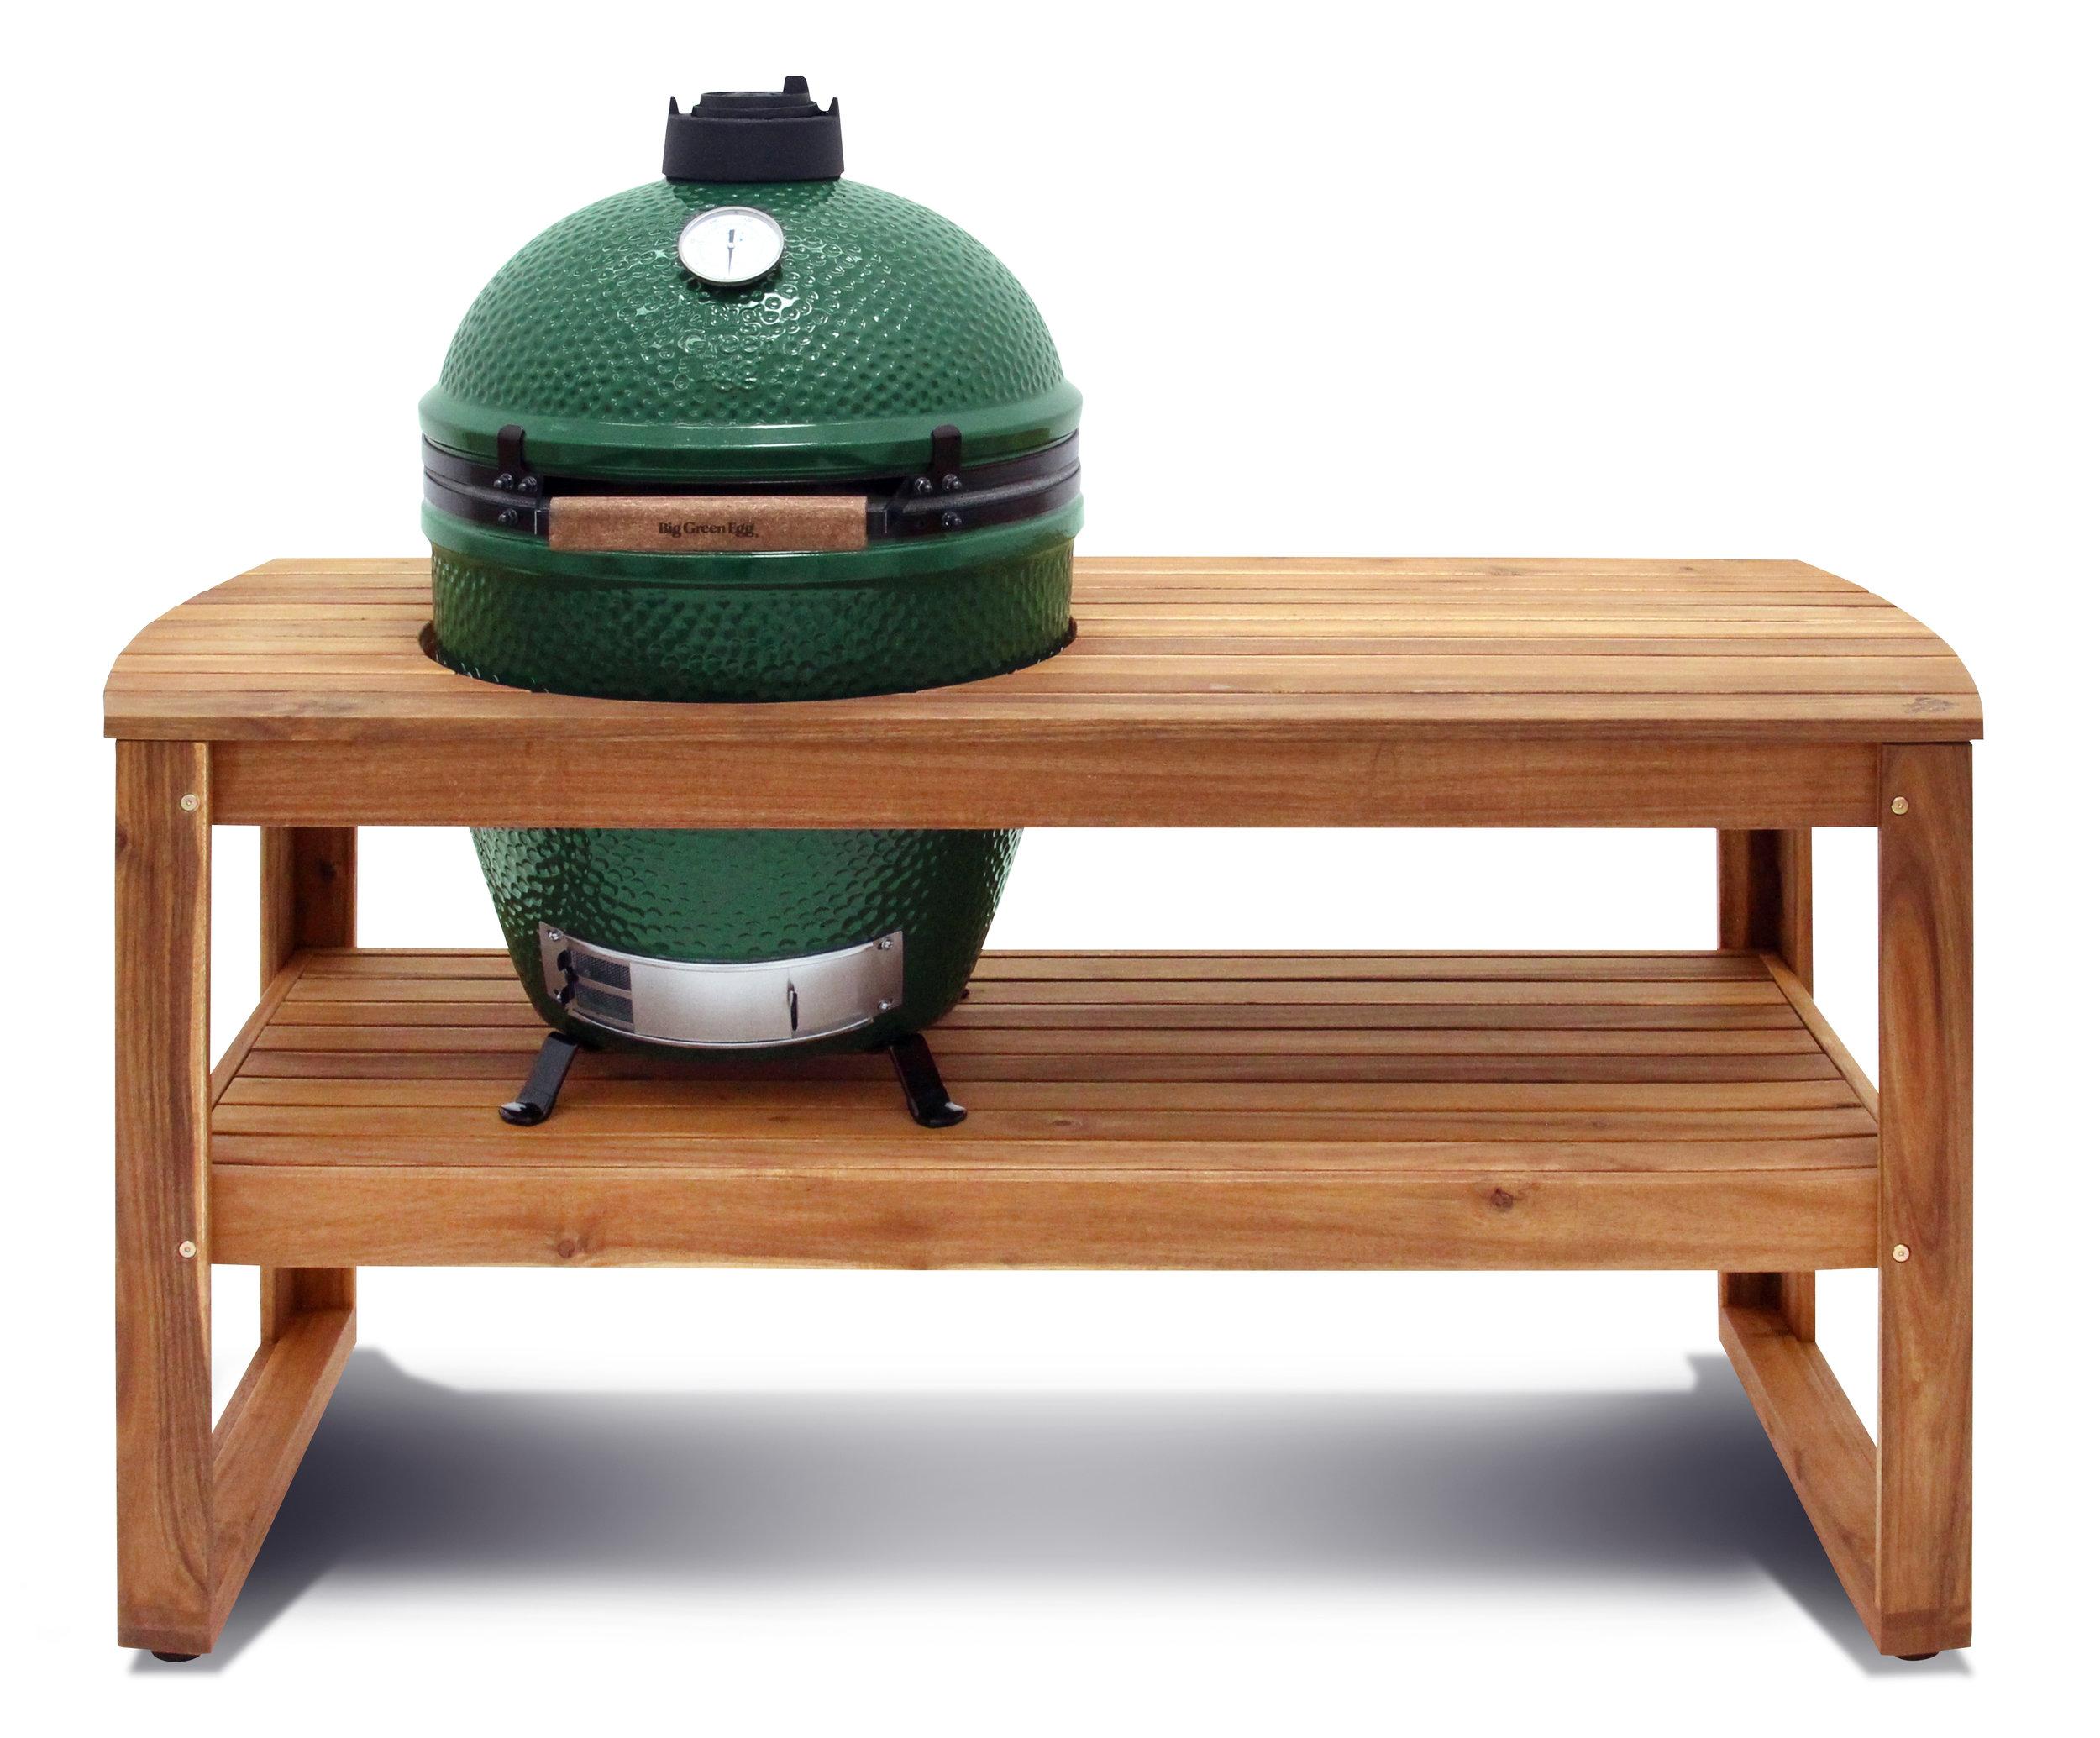 Hardwood Tables